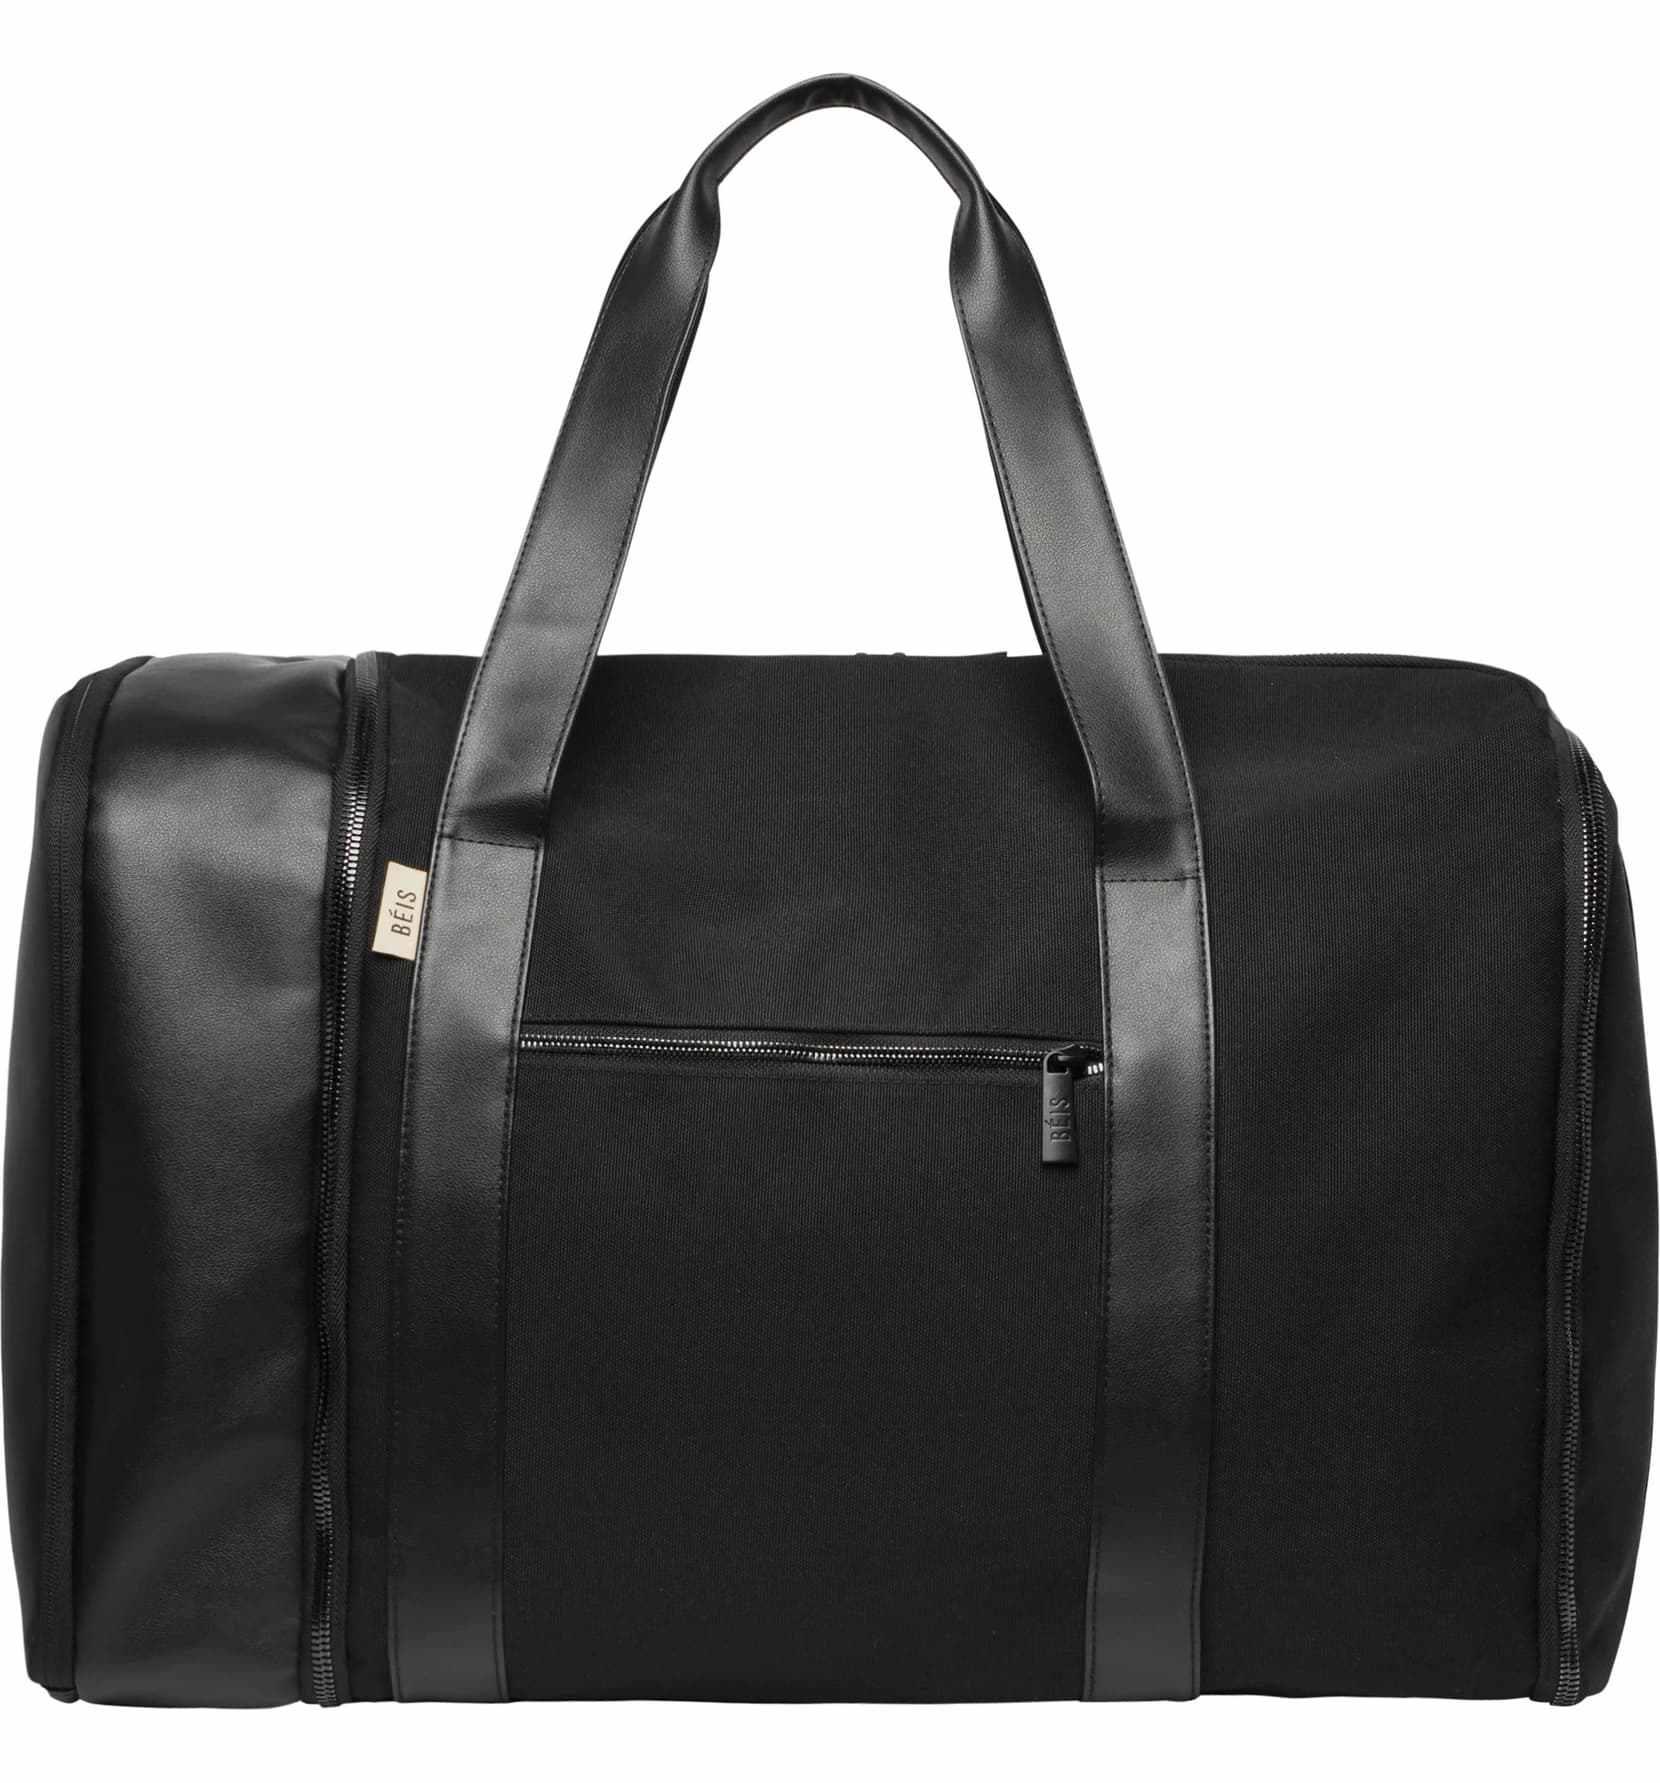 Travel Multifunction Duffle Bag